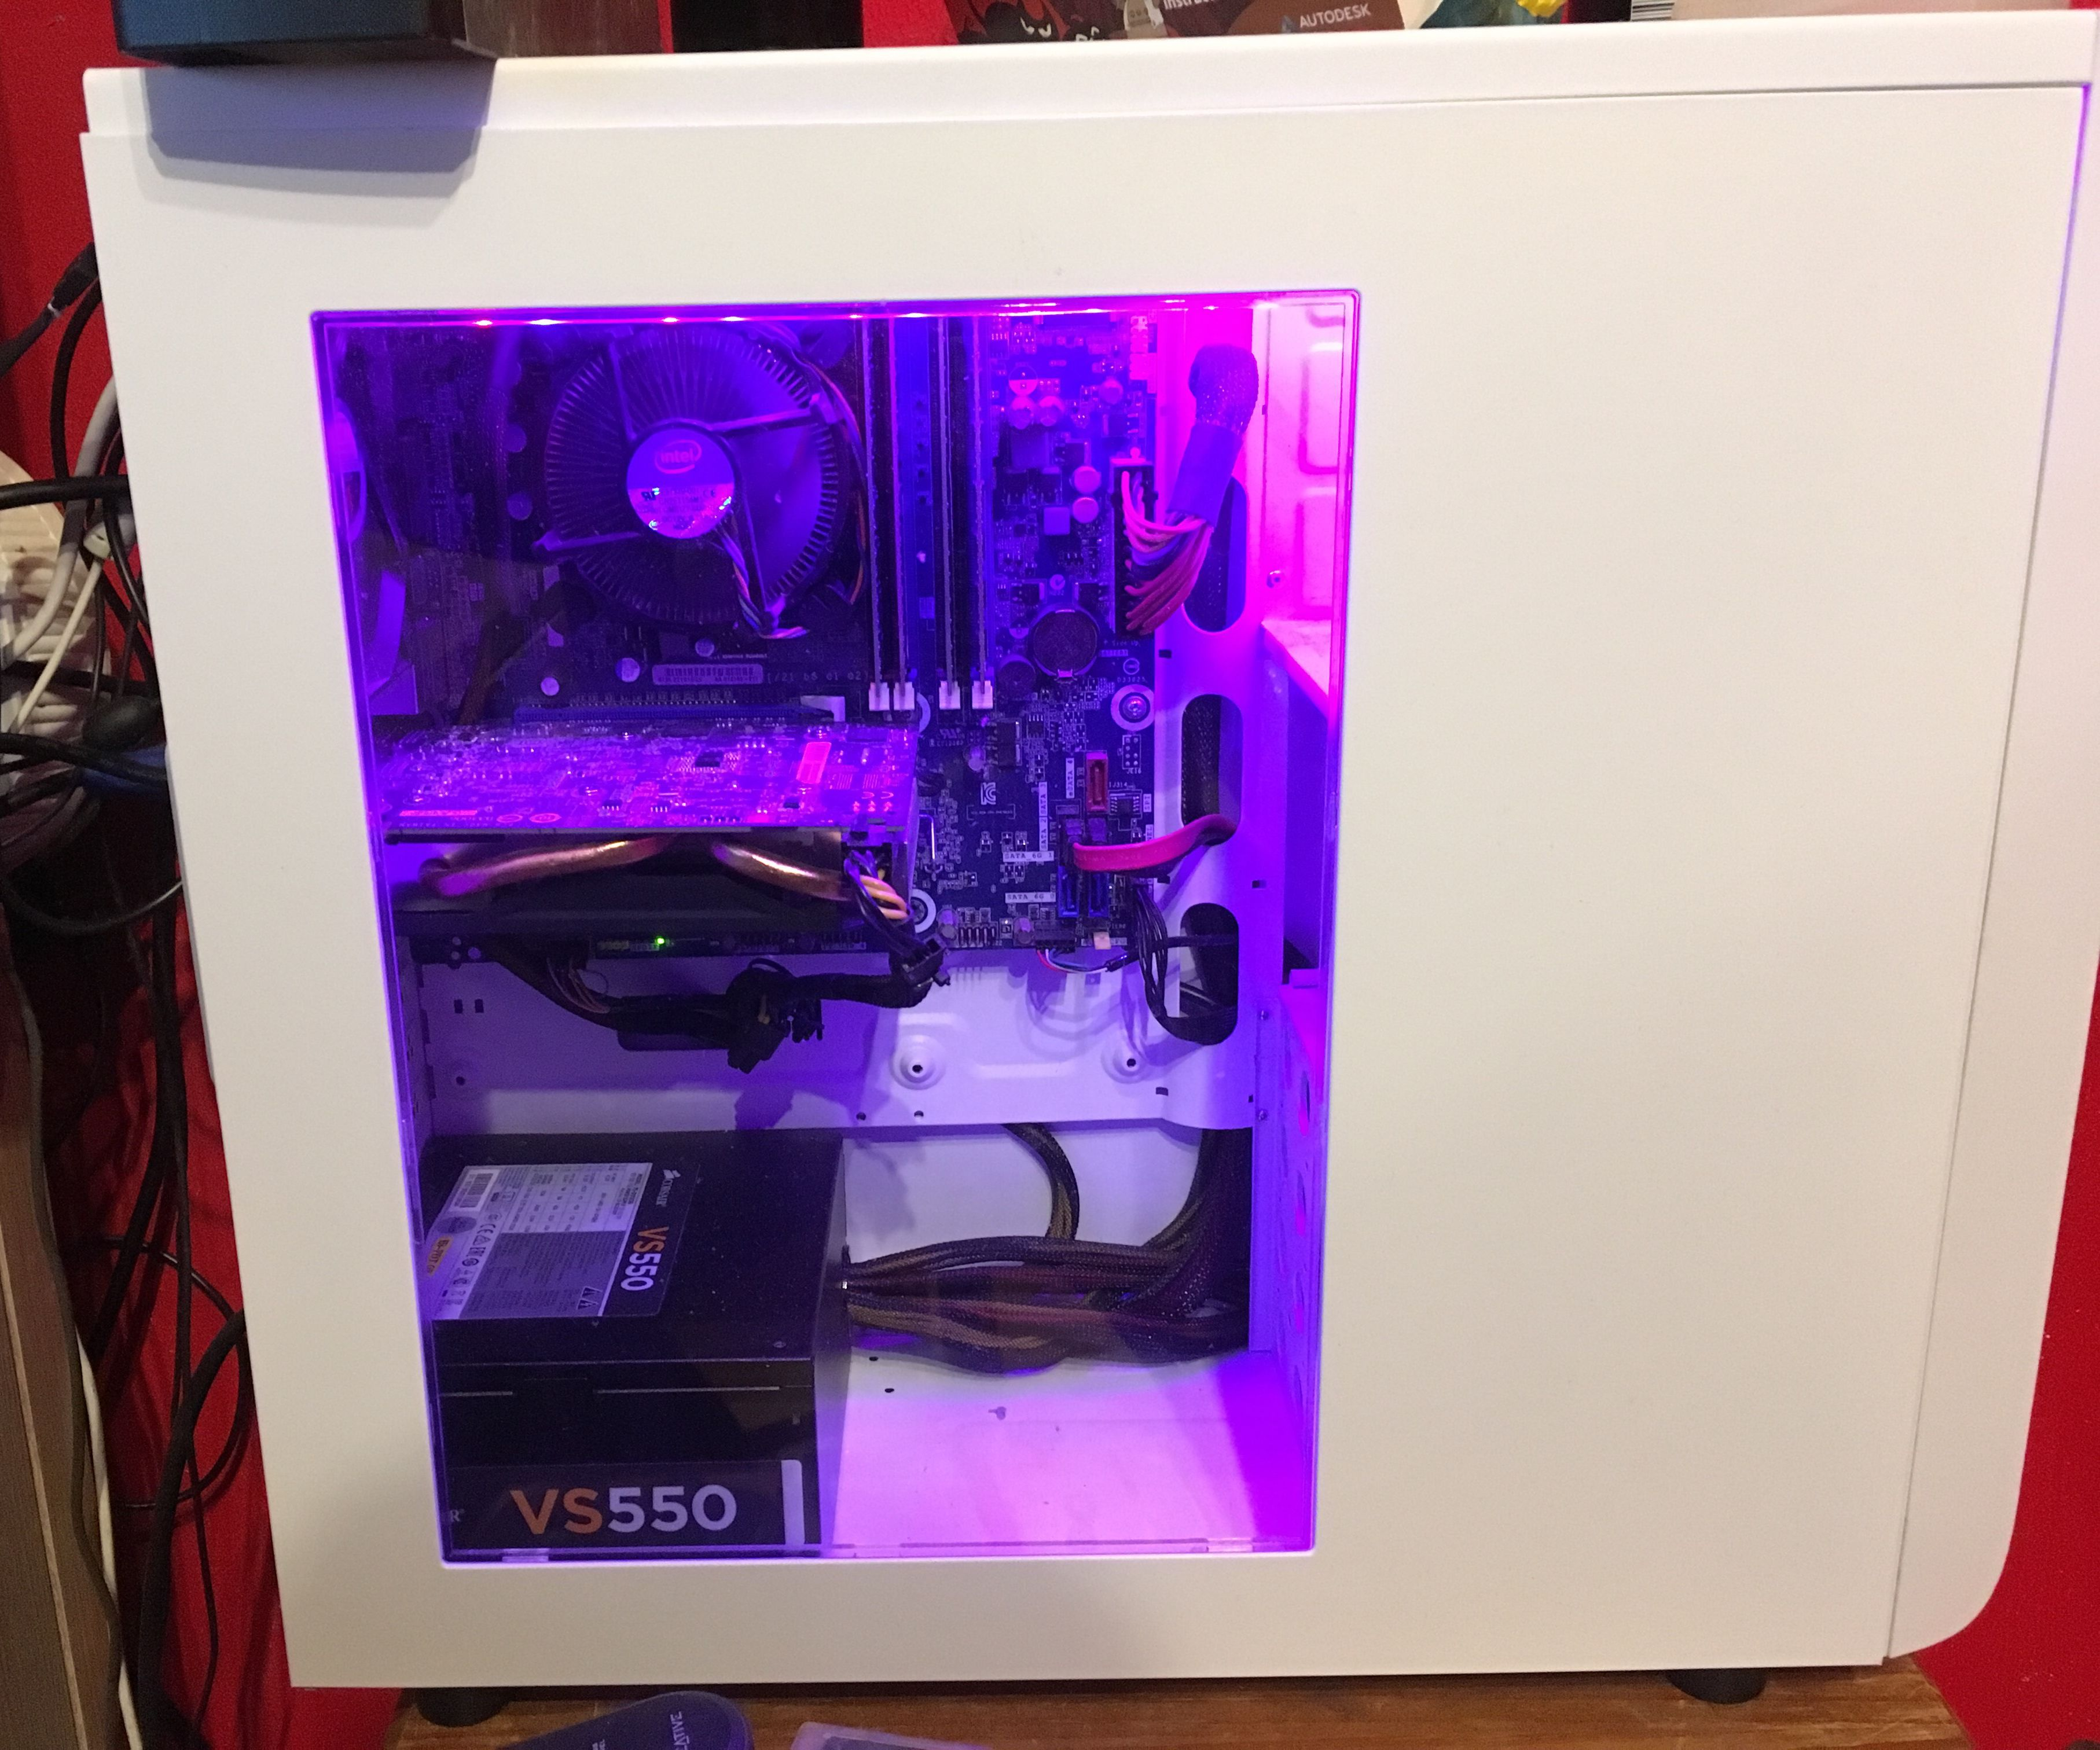 RGB-IFY Your Desktop Computer!